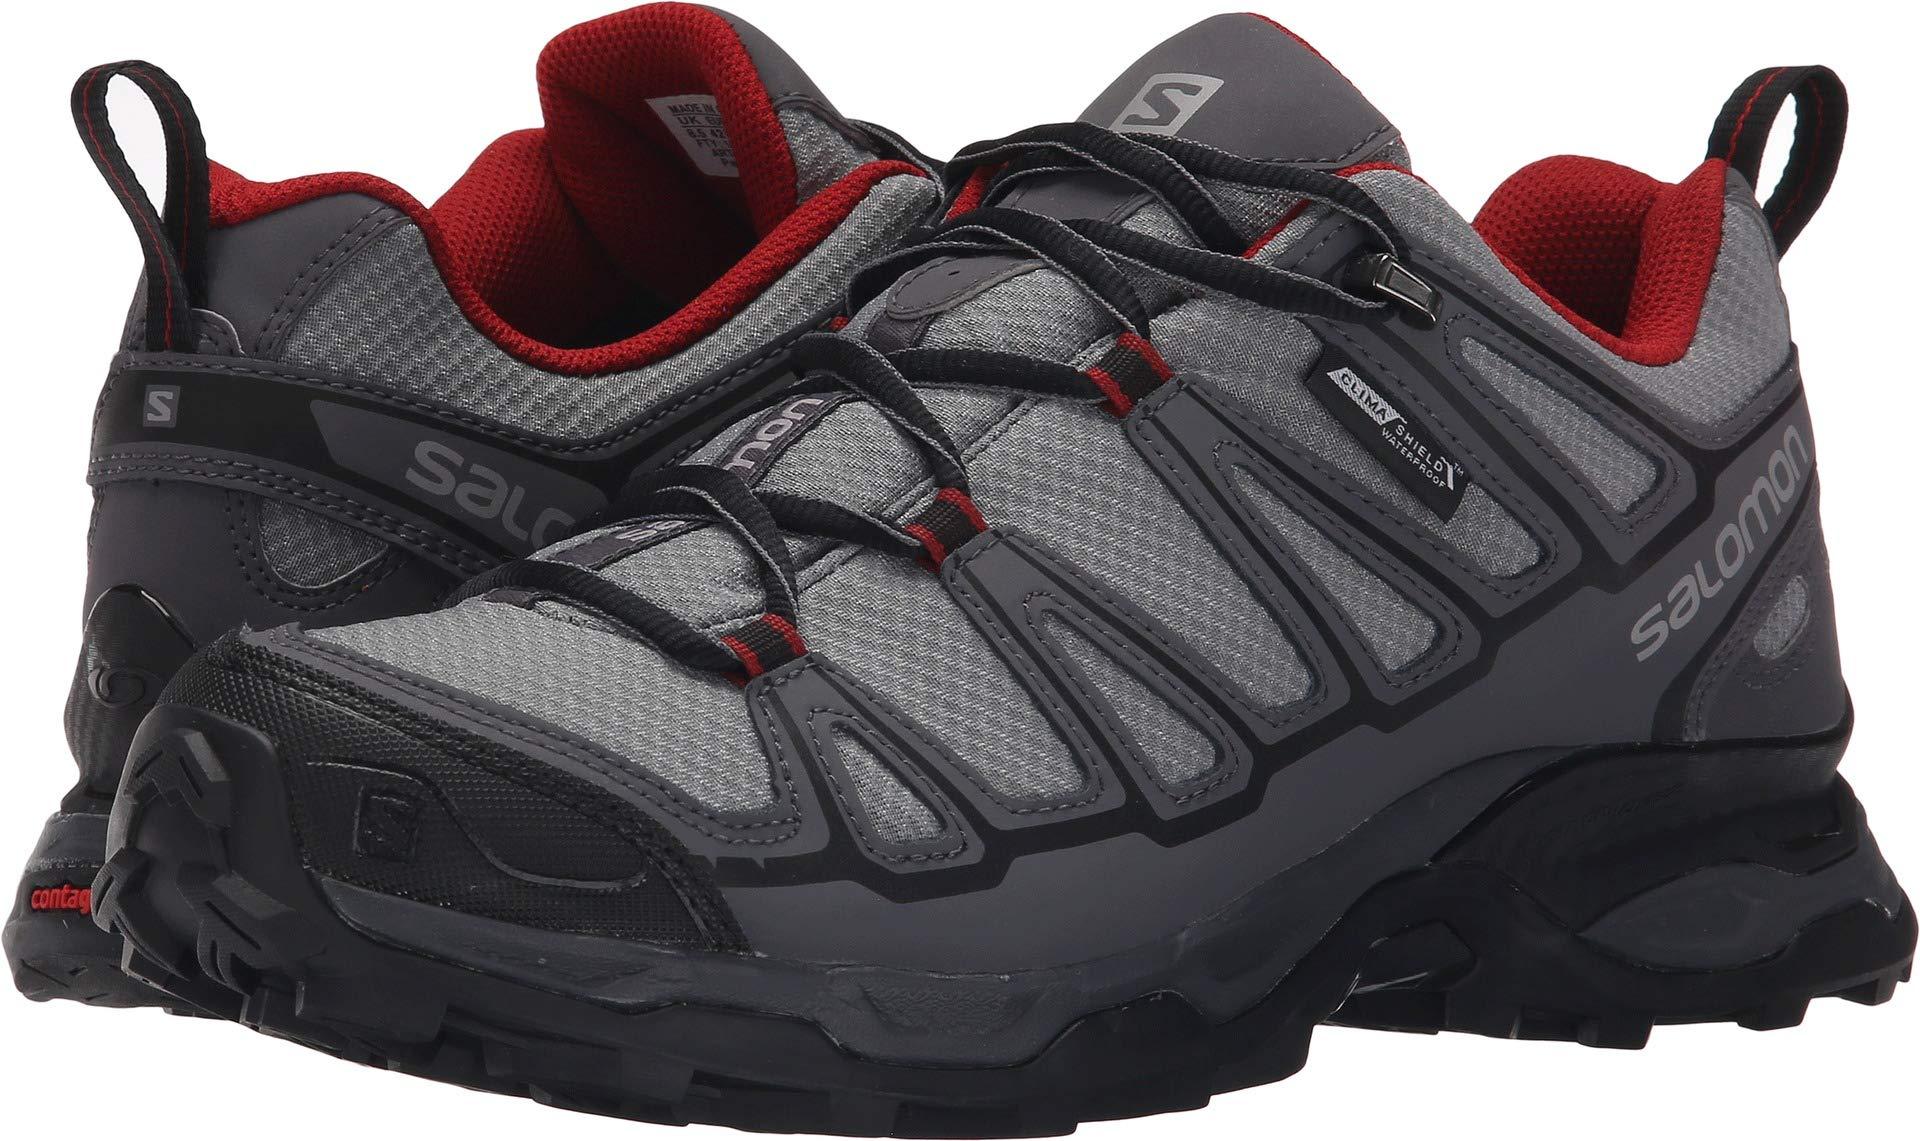 Salomon Men's X ULTRA PRIME CS Waterproof Athletic Shoe, pearl grey, 8.5 M US